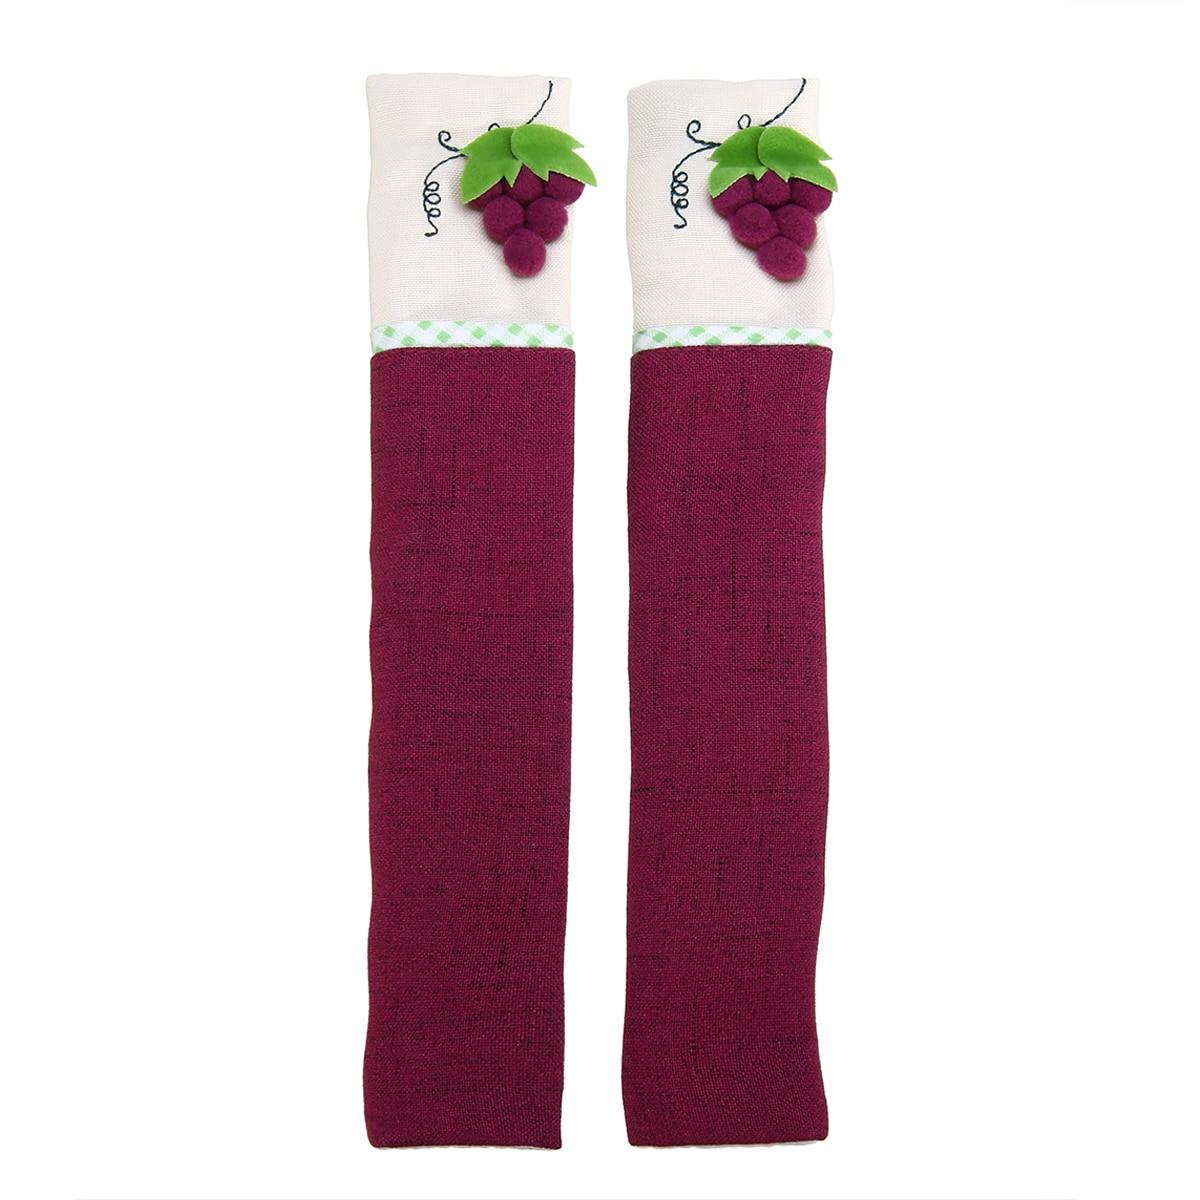 1Pair Refrigerator Handle Covers Purple Handle Wraps Cotton Linen Handle Protector 26 x 12cm for Kitchen Appliance